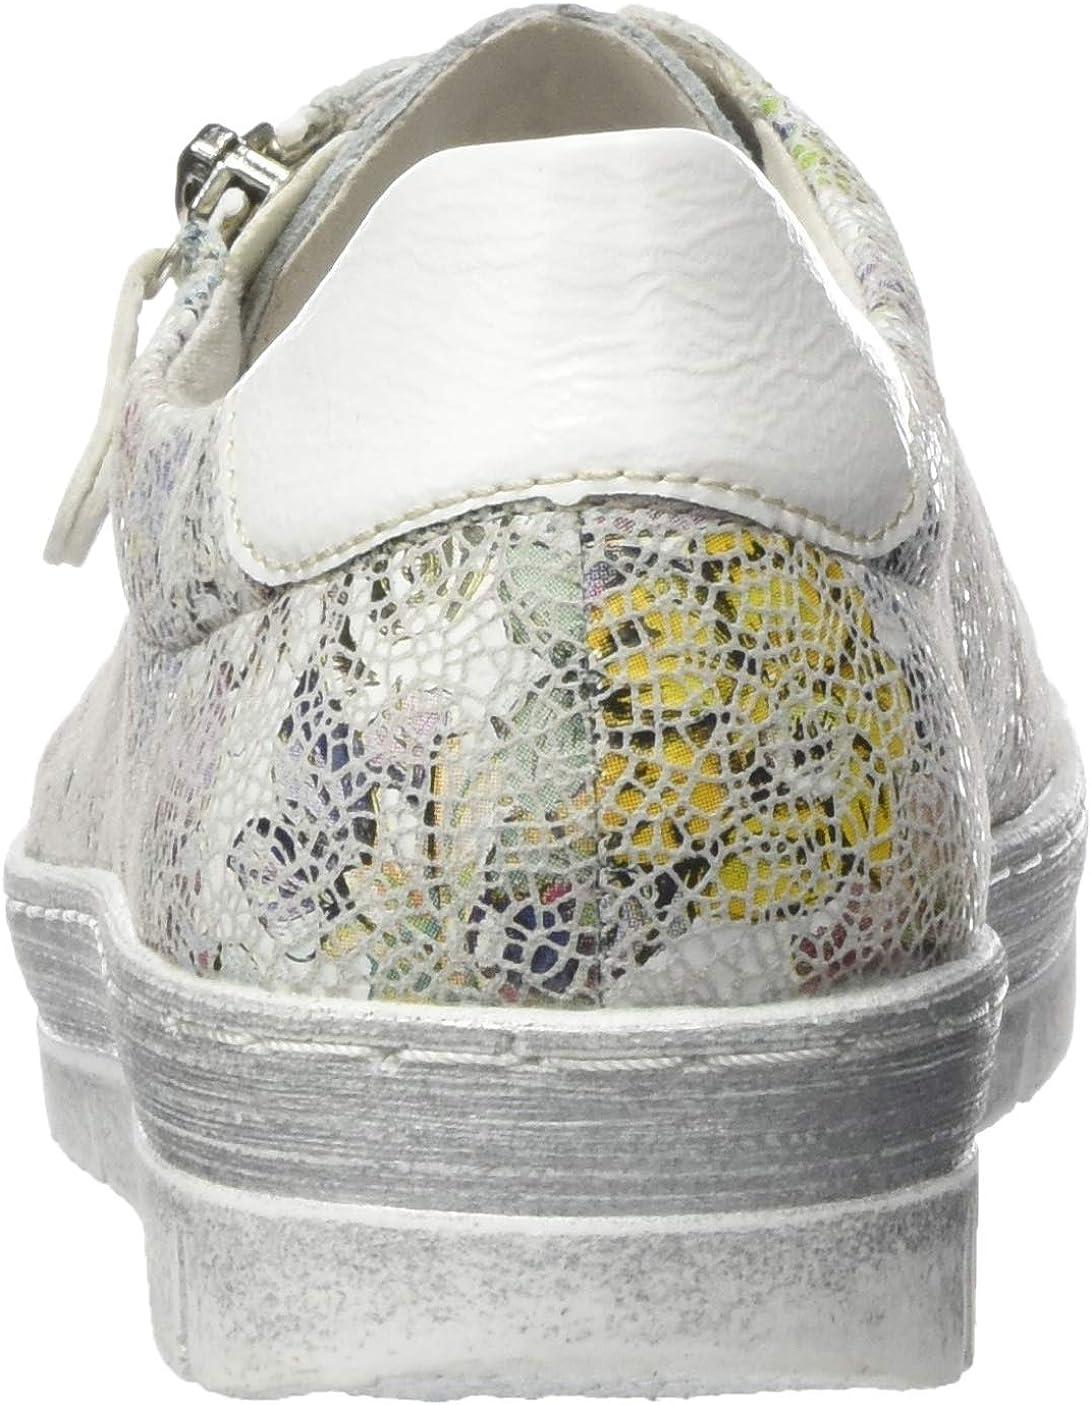 Remonte D5800, Sneakers Basses Femme Multicolore Ice Multi Bianco 93